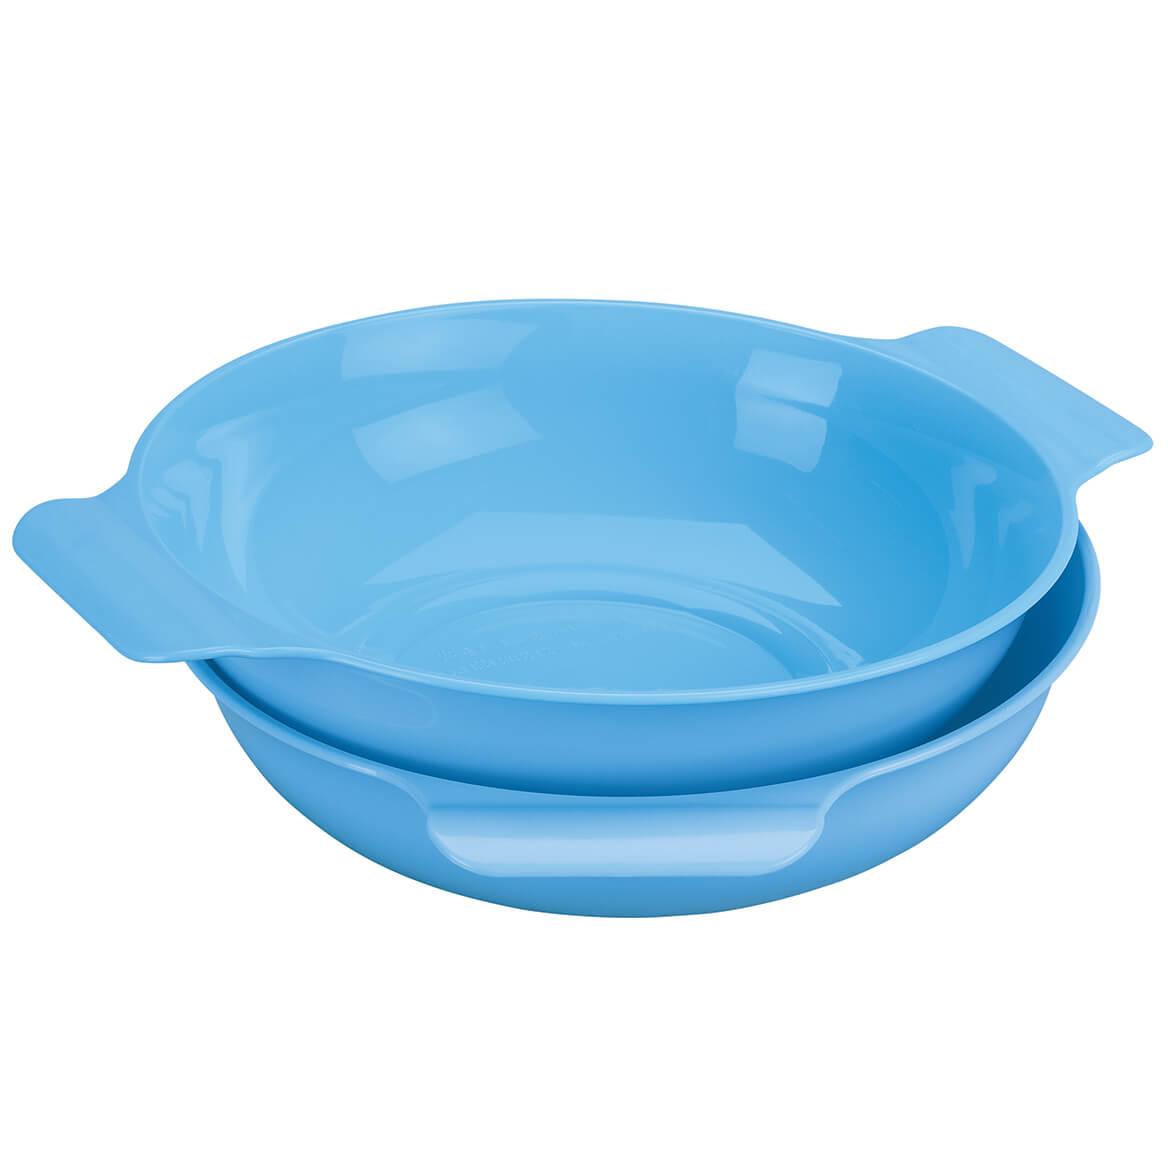 9-Pc. Microwave Cookware Set-371754